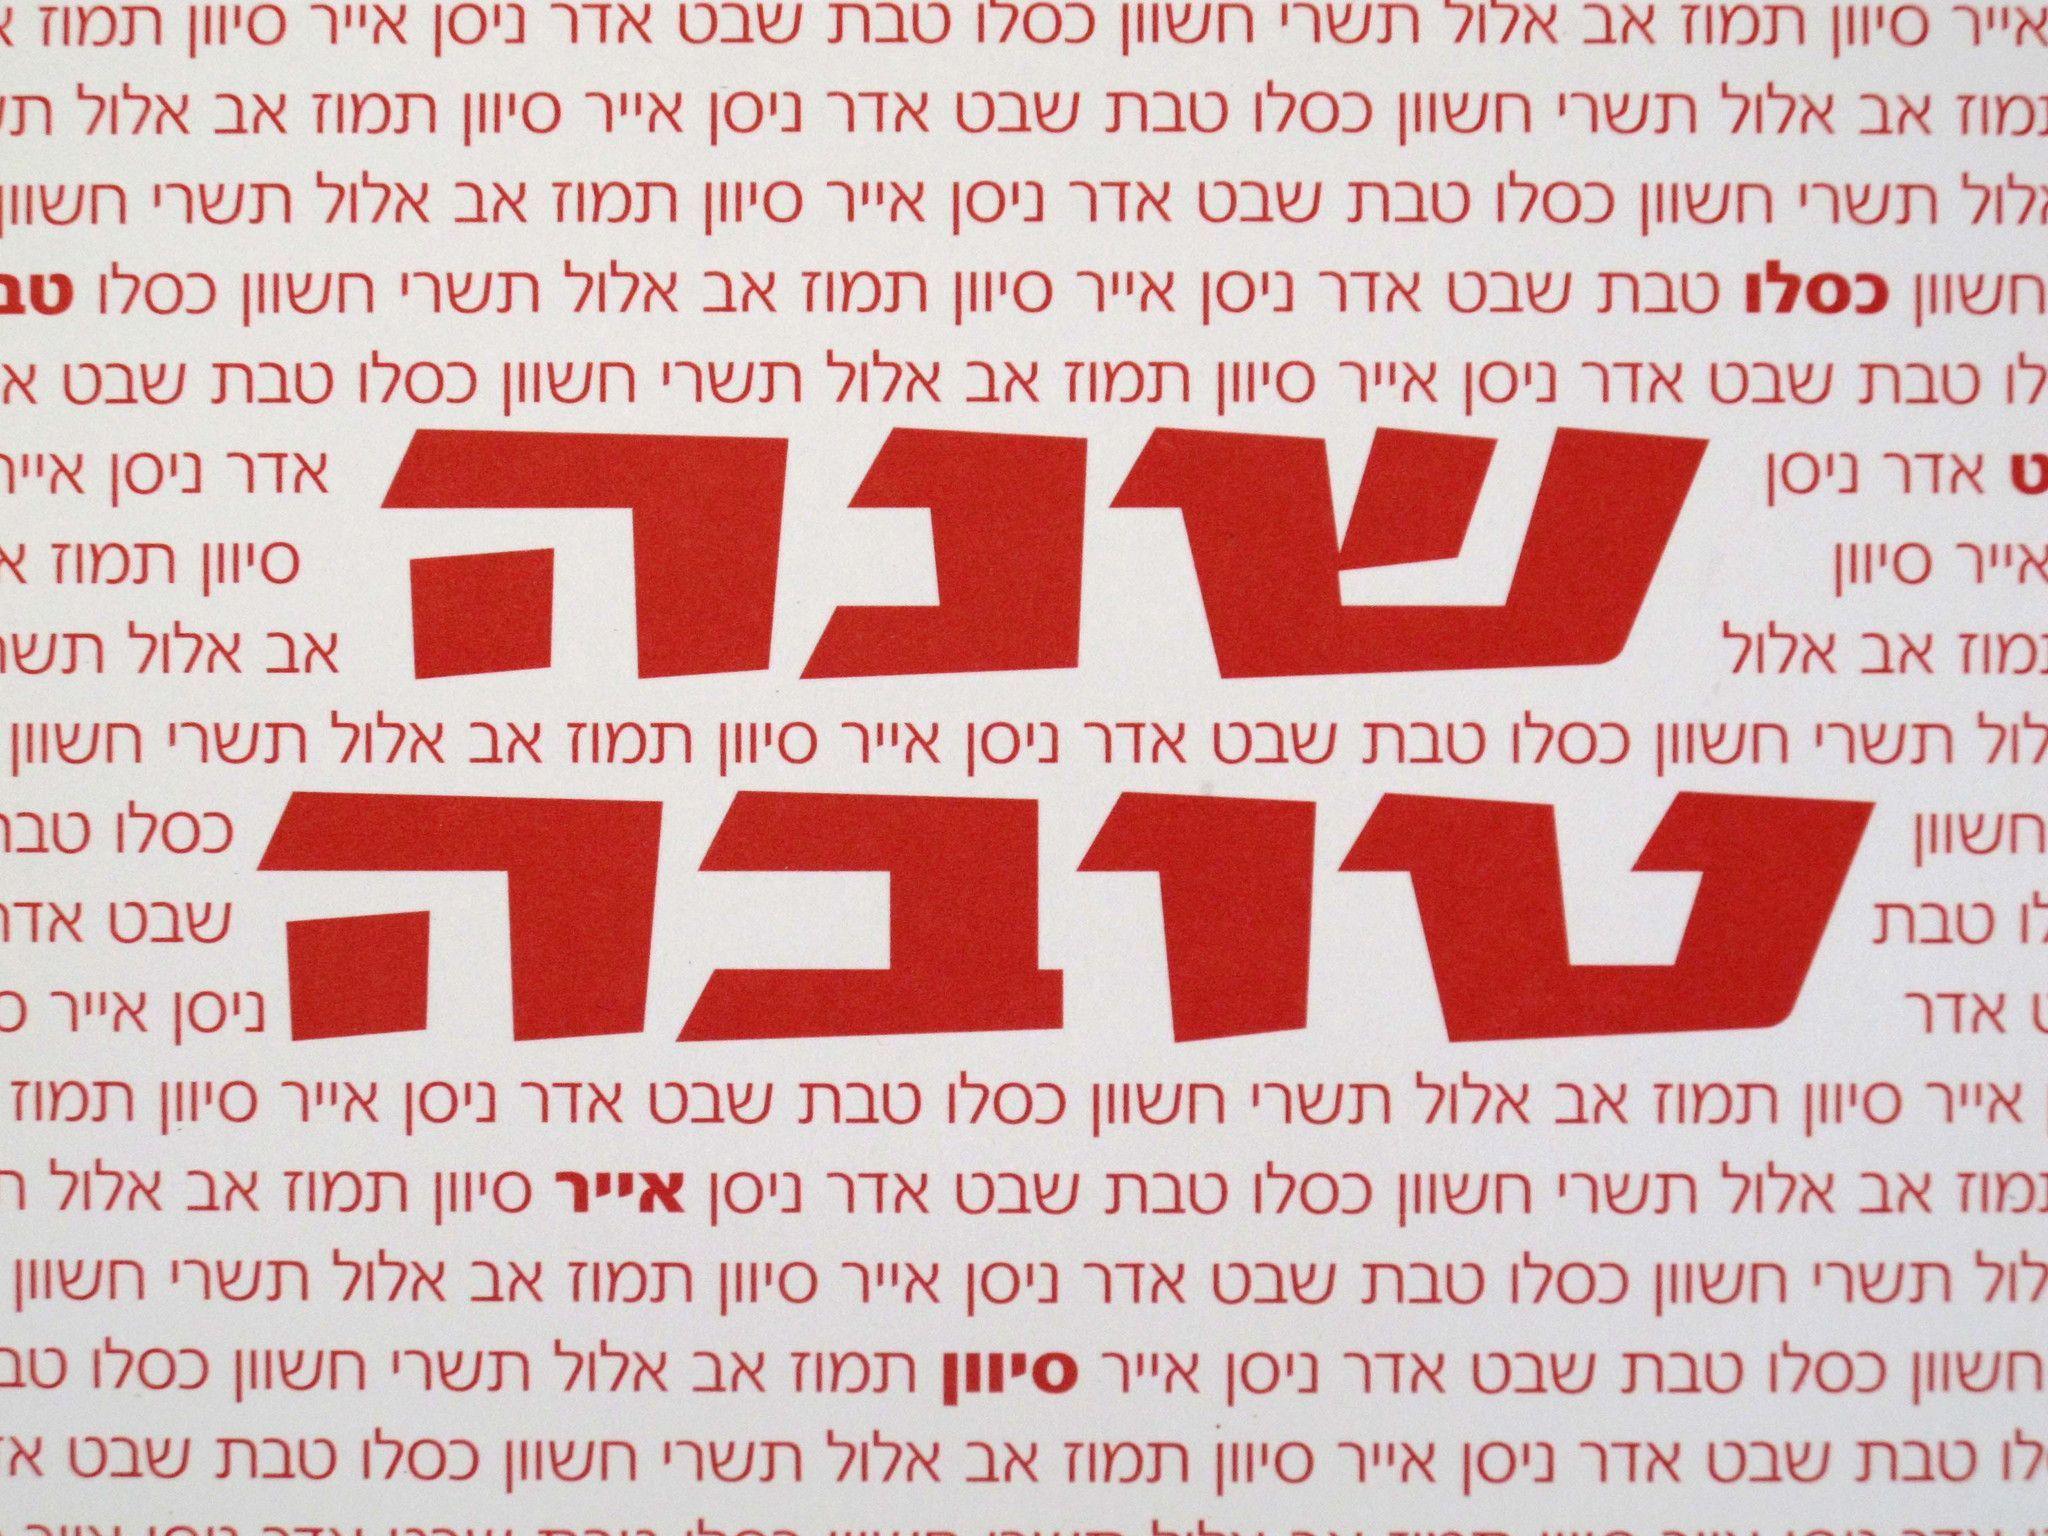 Jewish New Year Rosh Hashana Greeting Card Rosh hashanah